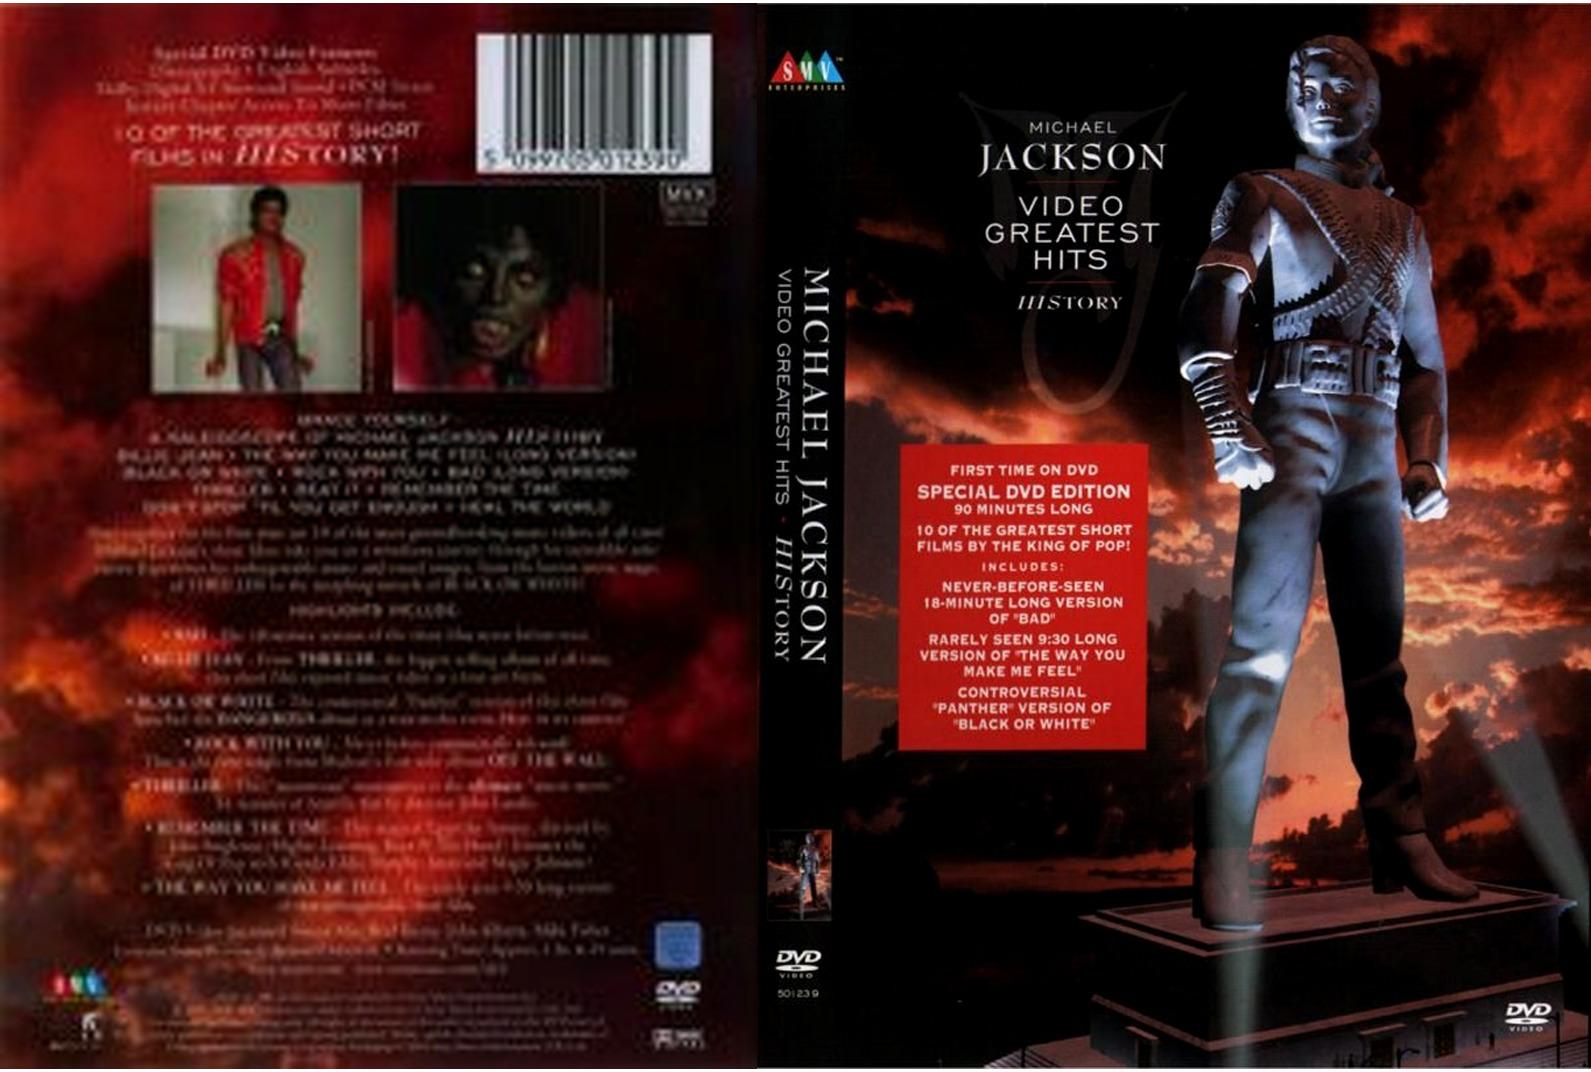 http://2.bp.blogspot.com/_WXp_6CB1TD0/S_2EXOrS2xI/AAAAAAAABDc/rIDkx4P5OSY/s1600/michael+jackson+greatest+hits+history.jpg